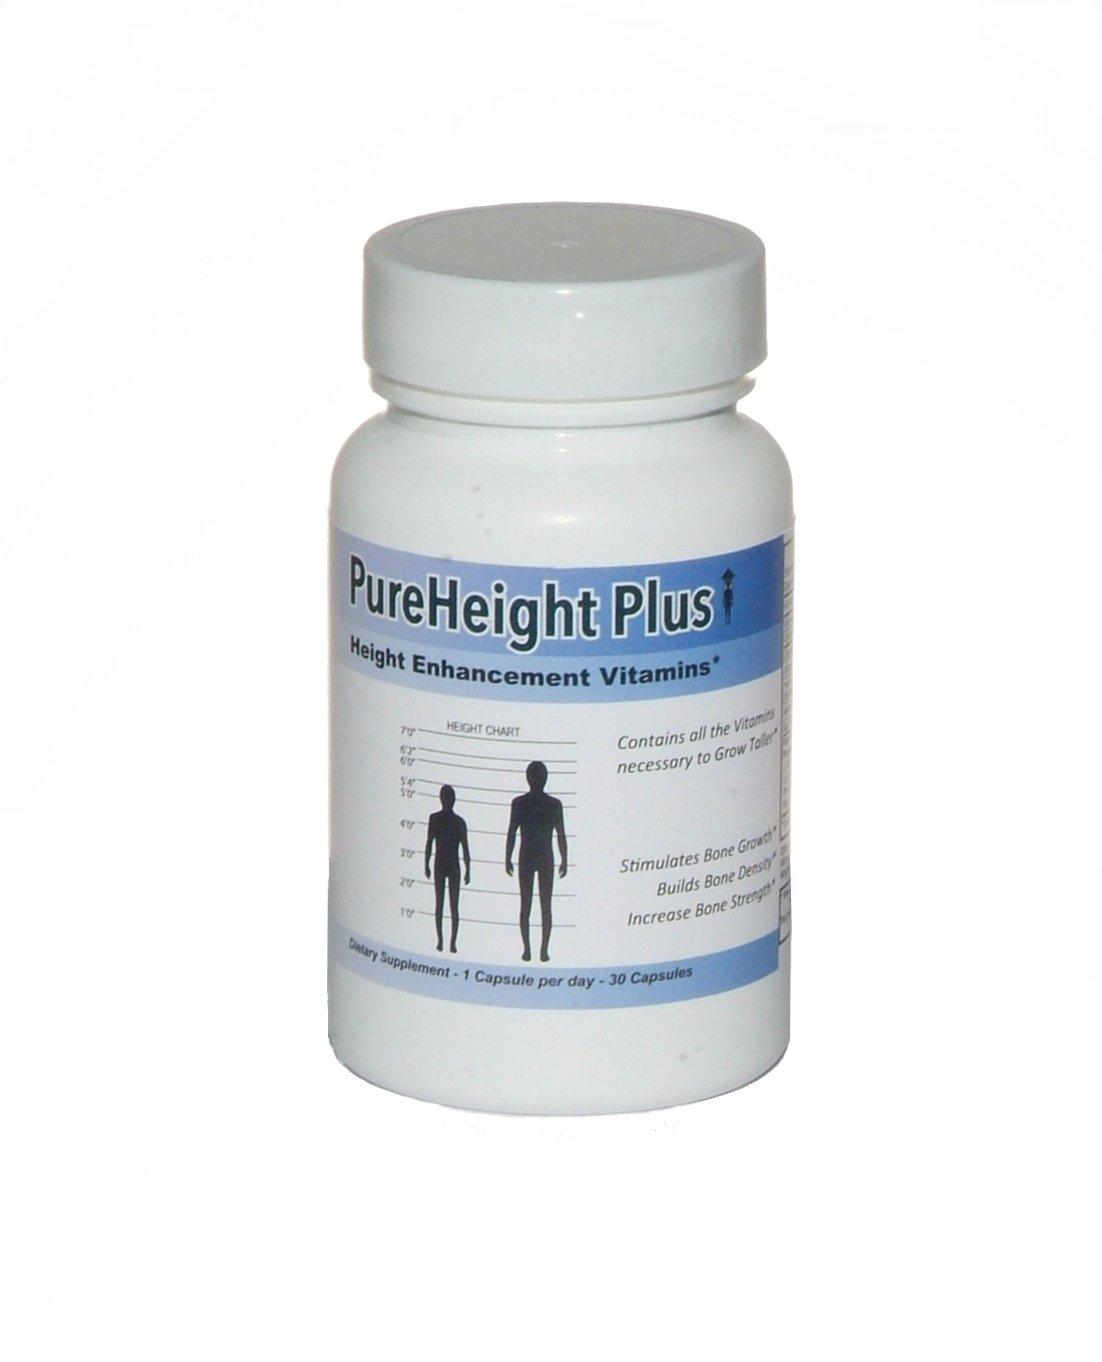 PureHeight Plus Height Enhancement Dietary Supplement (30 Capsules)